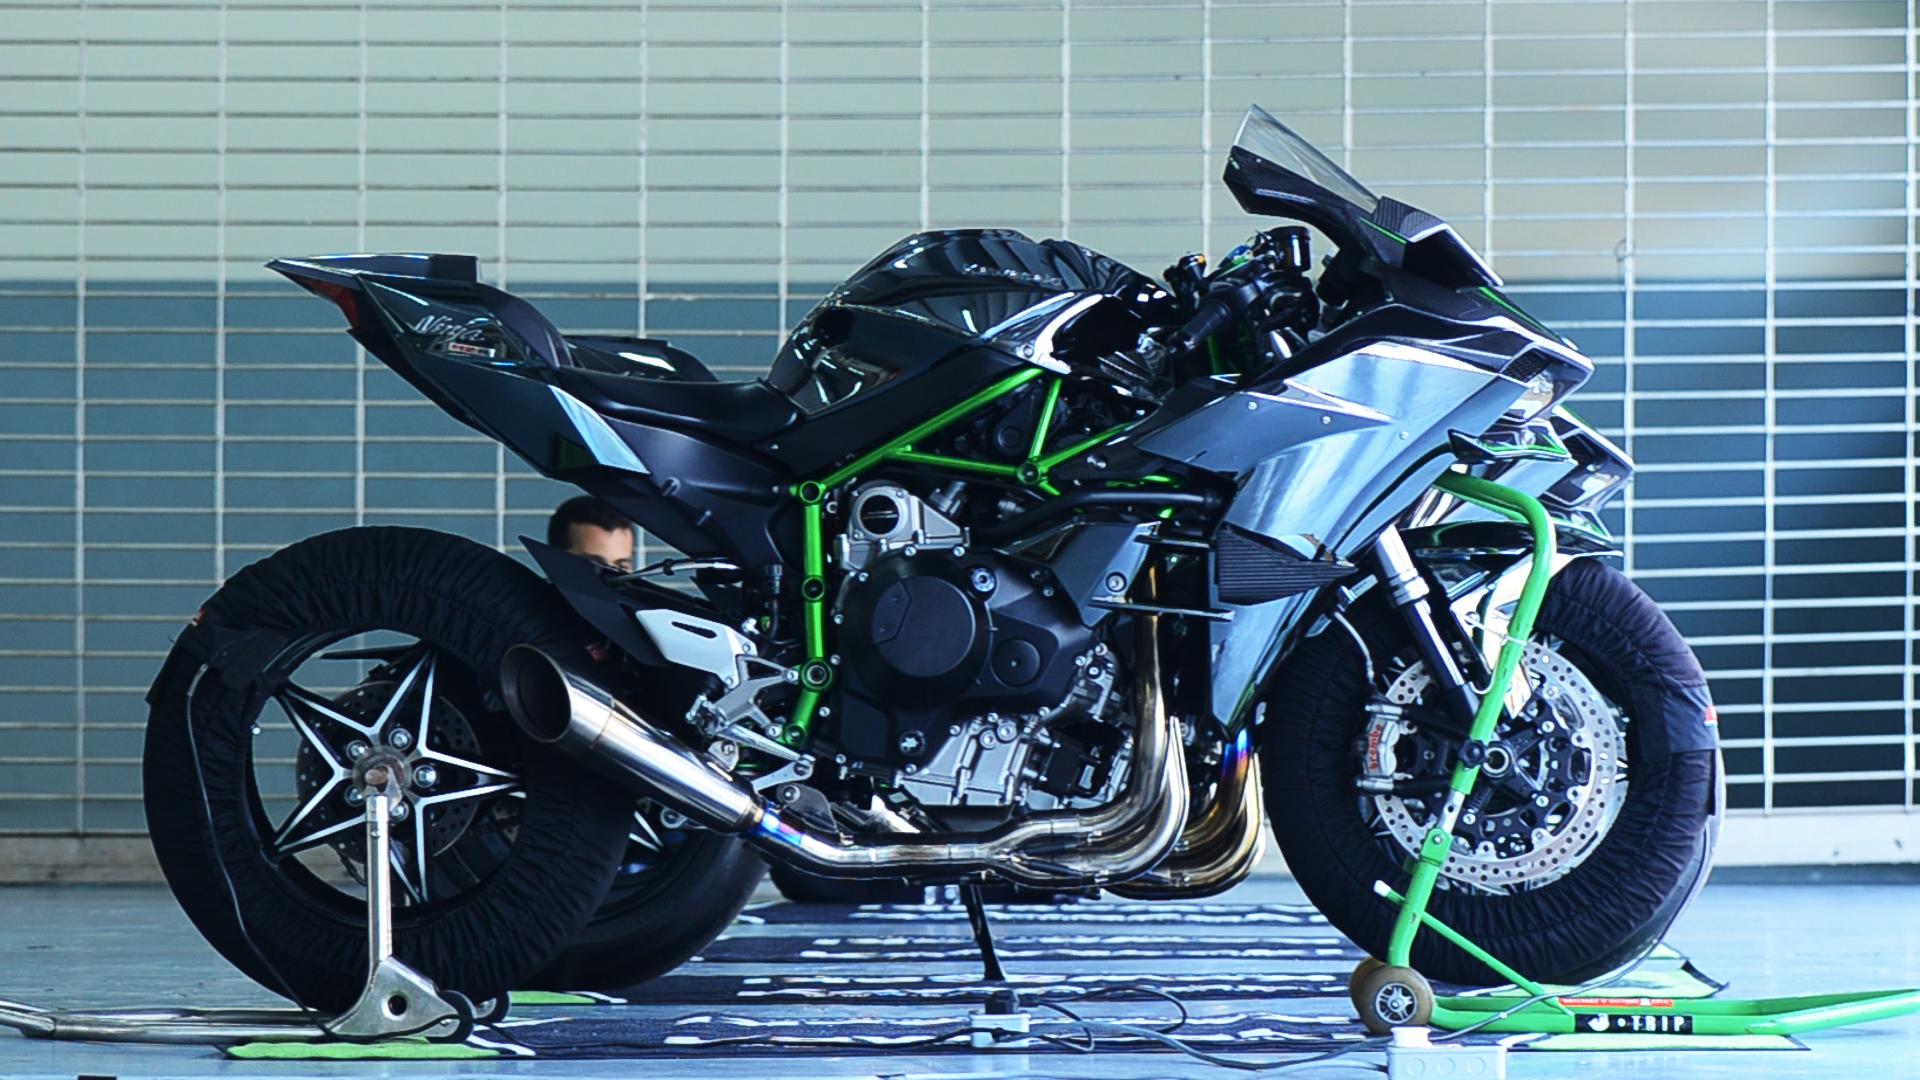 Kawasaki H2 Amp H2r Ridden And Filmed Malaysian Riders